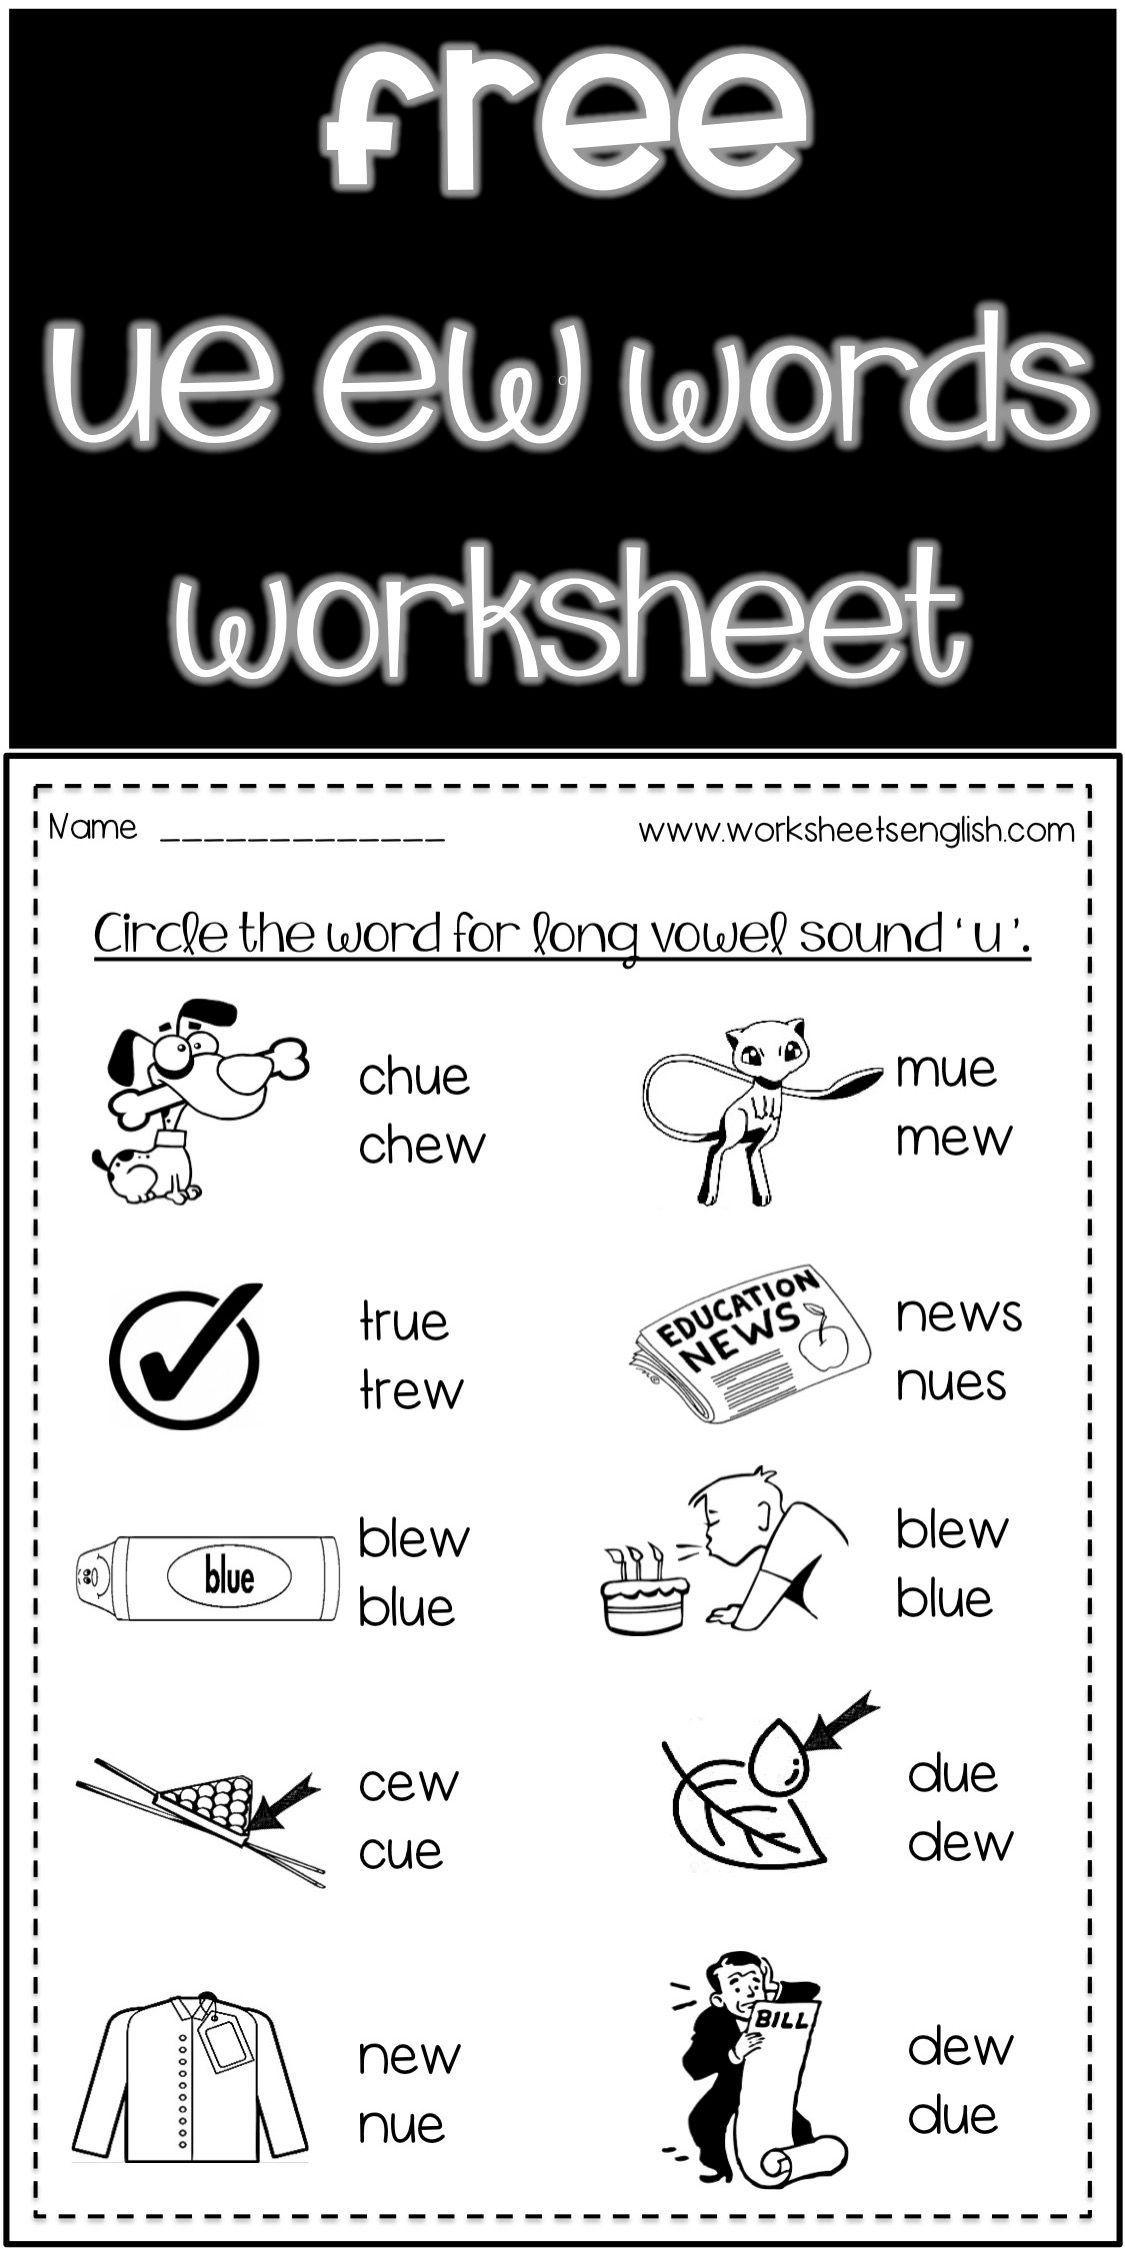 Long Vowel Words Spell Worksheets Free Www Worksheetsenglish Com Phonics Worksheets Free Phonics Worksheets Phonics Words [ 2249 x 1125 Pixel ]